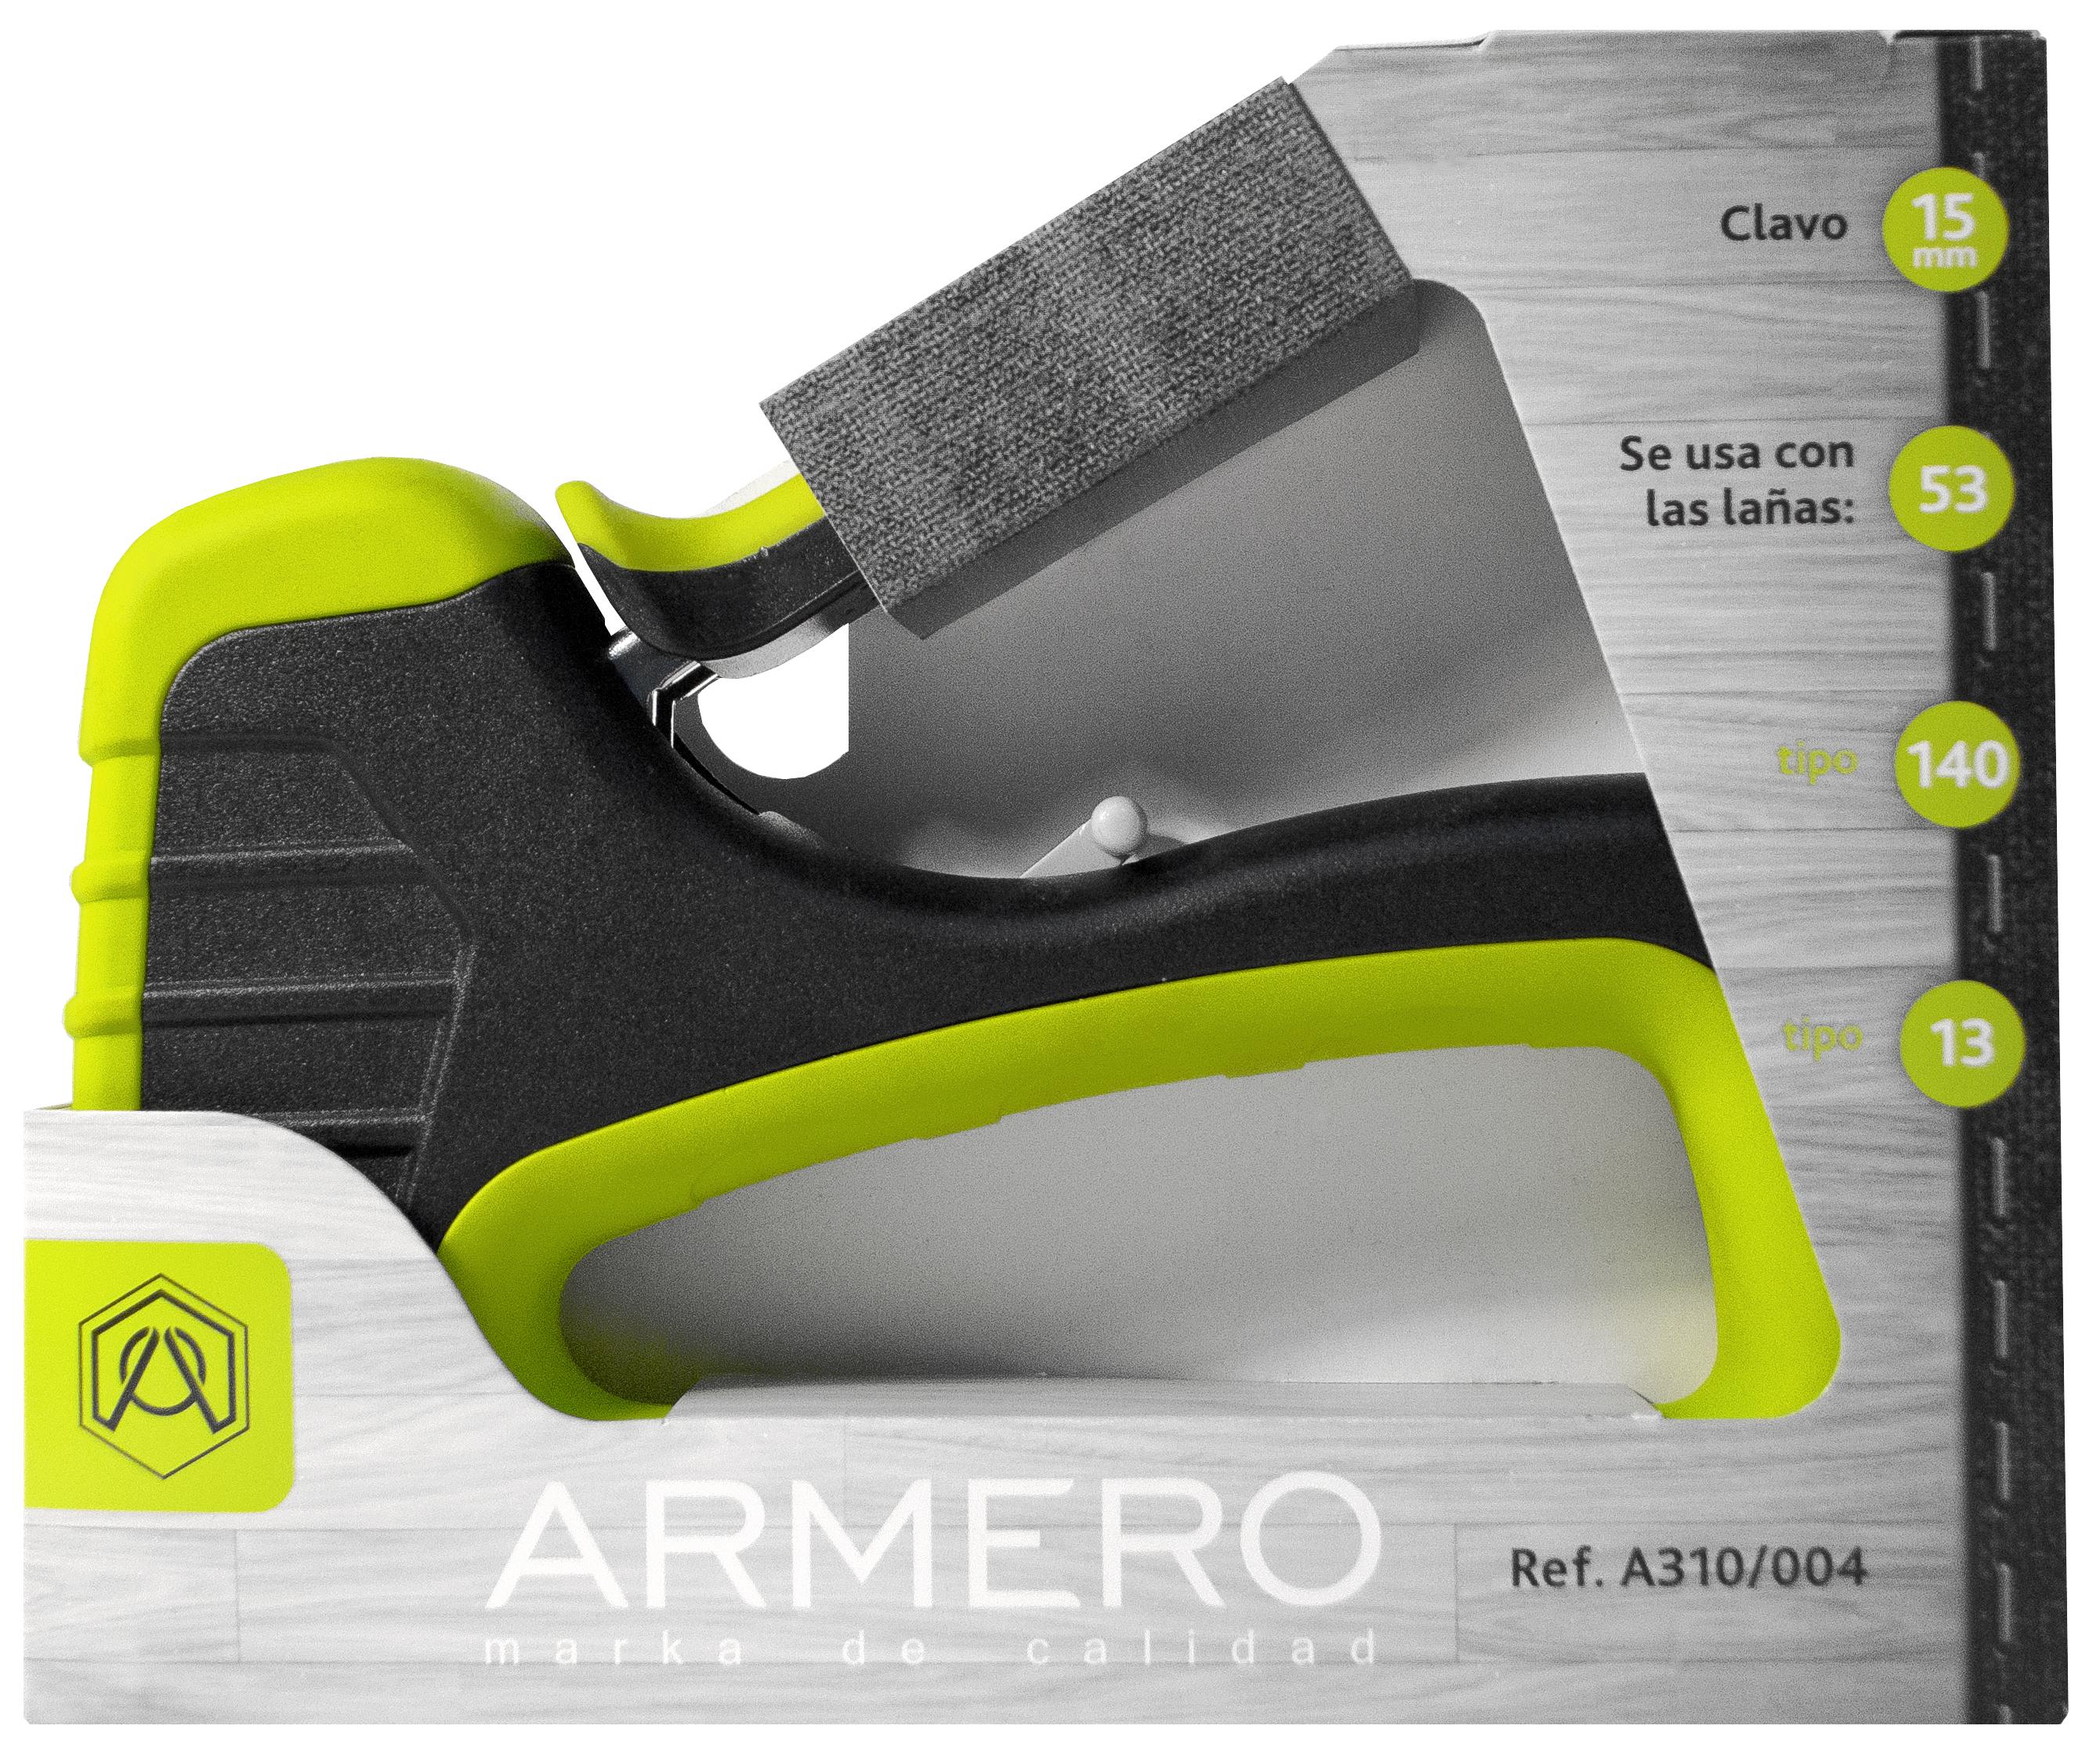 Купить Степлер Armero Ap310/004